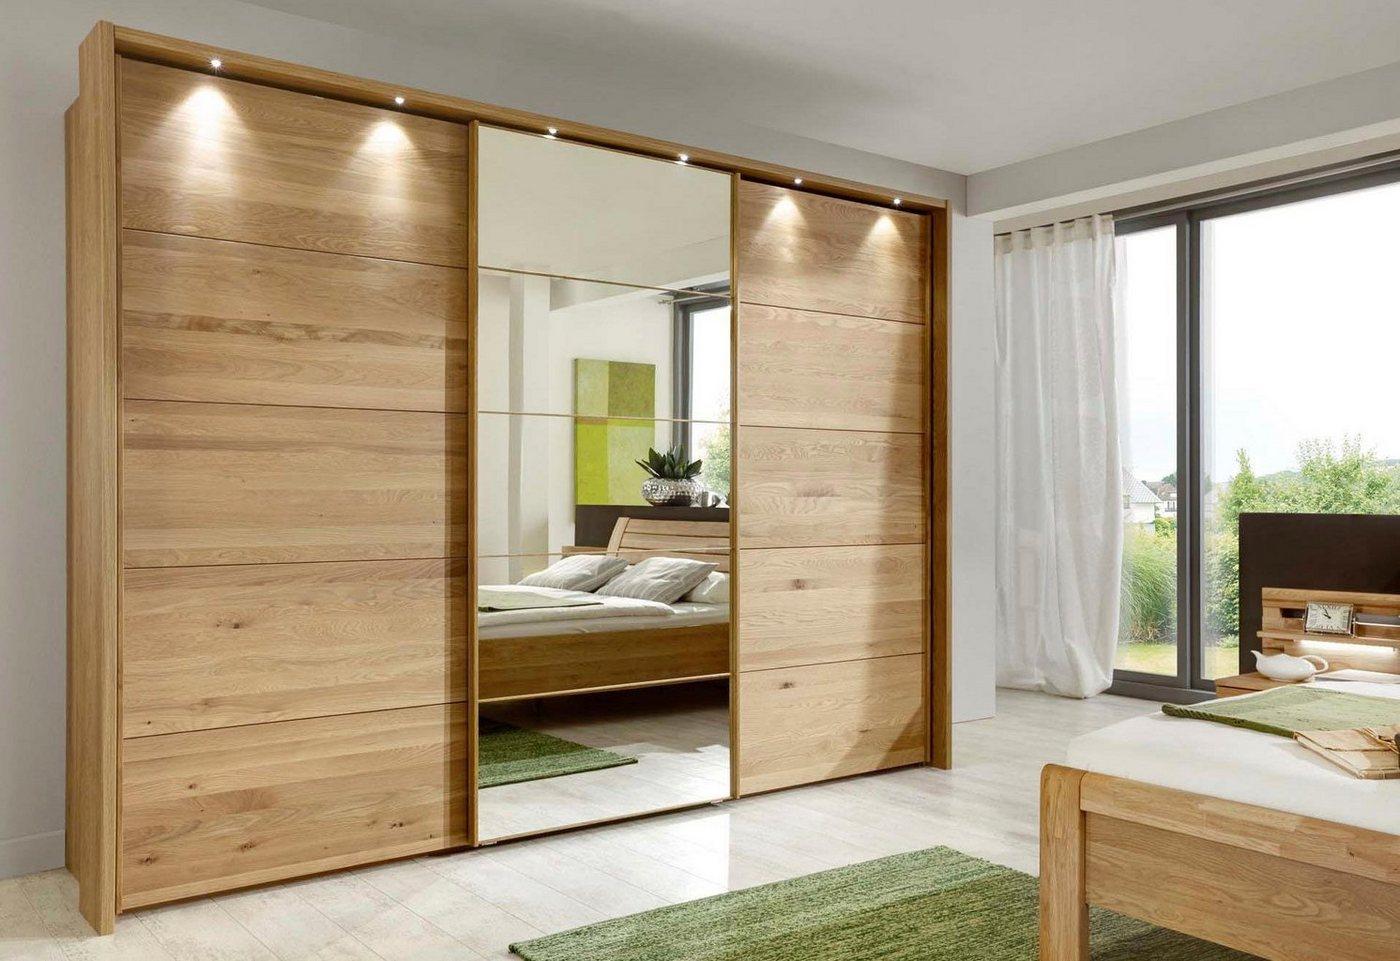 WIEMANN zweefdeurkast Kufstein met spiegeldeur, in 3 breedten